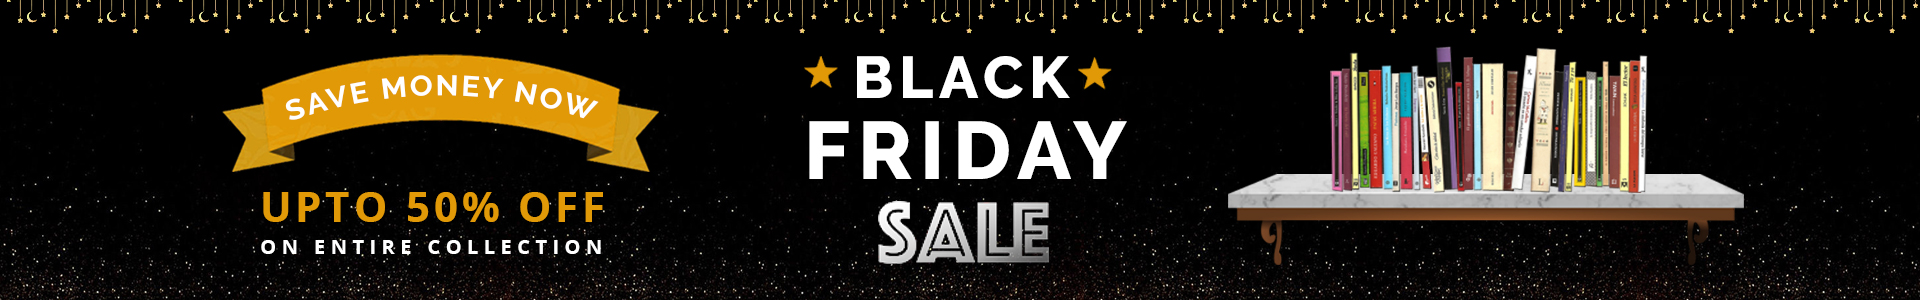 Page Header Banner - Black Friday Books for sale